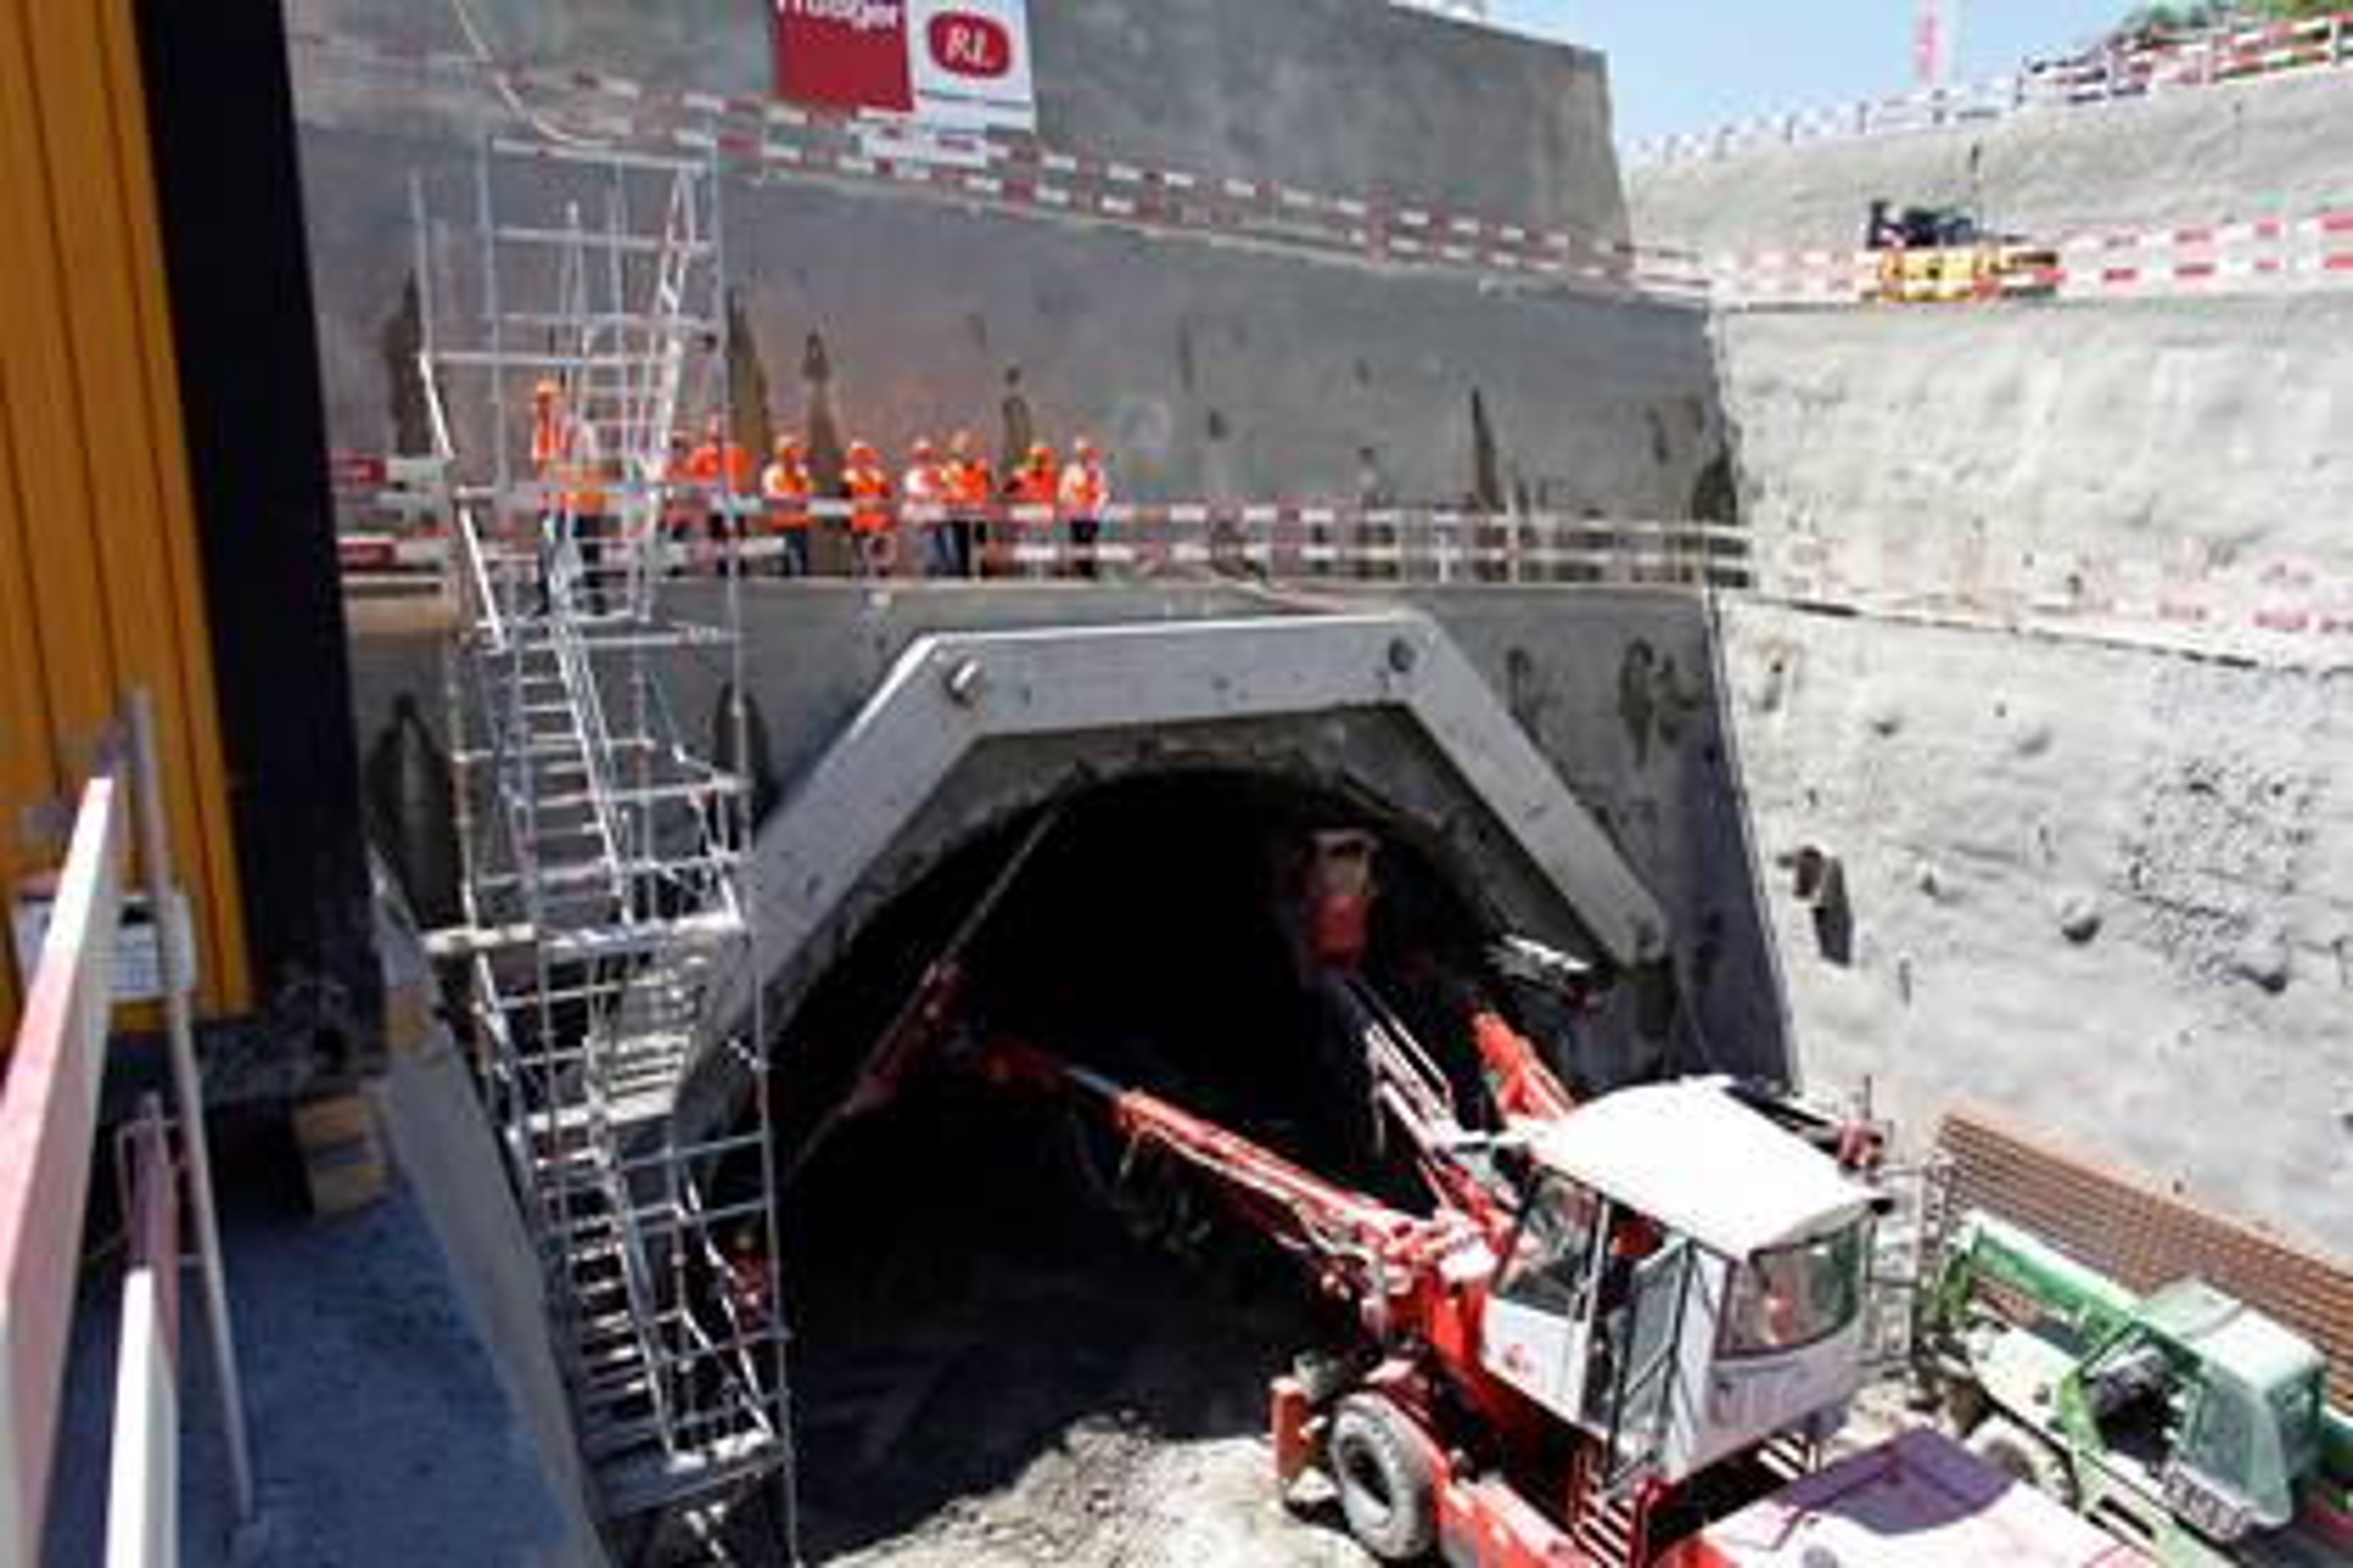 Bauprojekt Rosshäusern - Arbeiten am Westportal